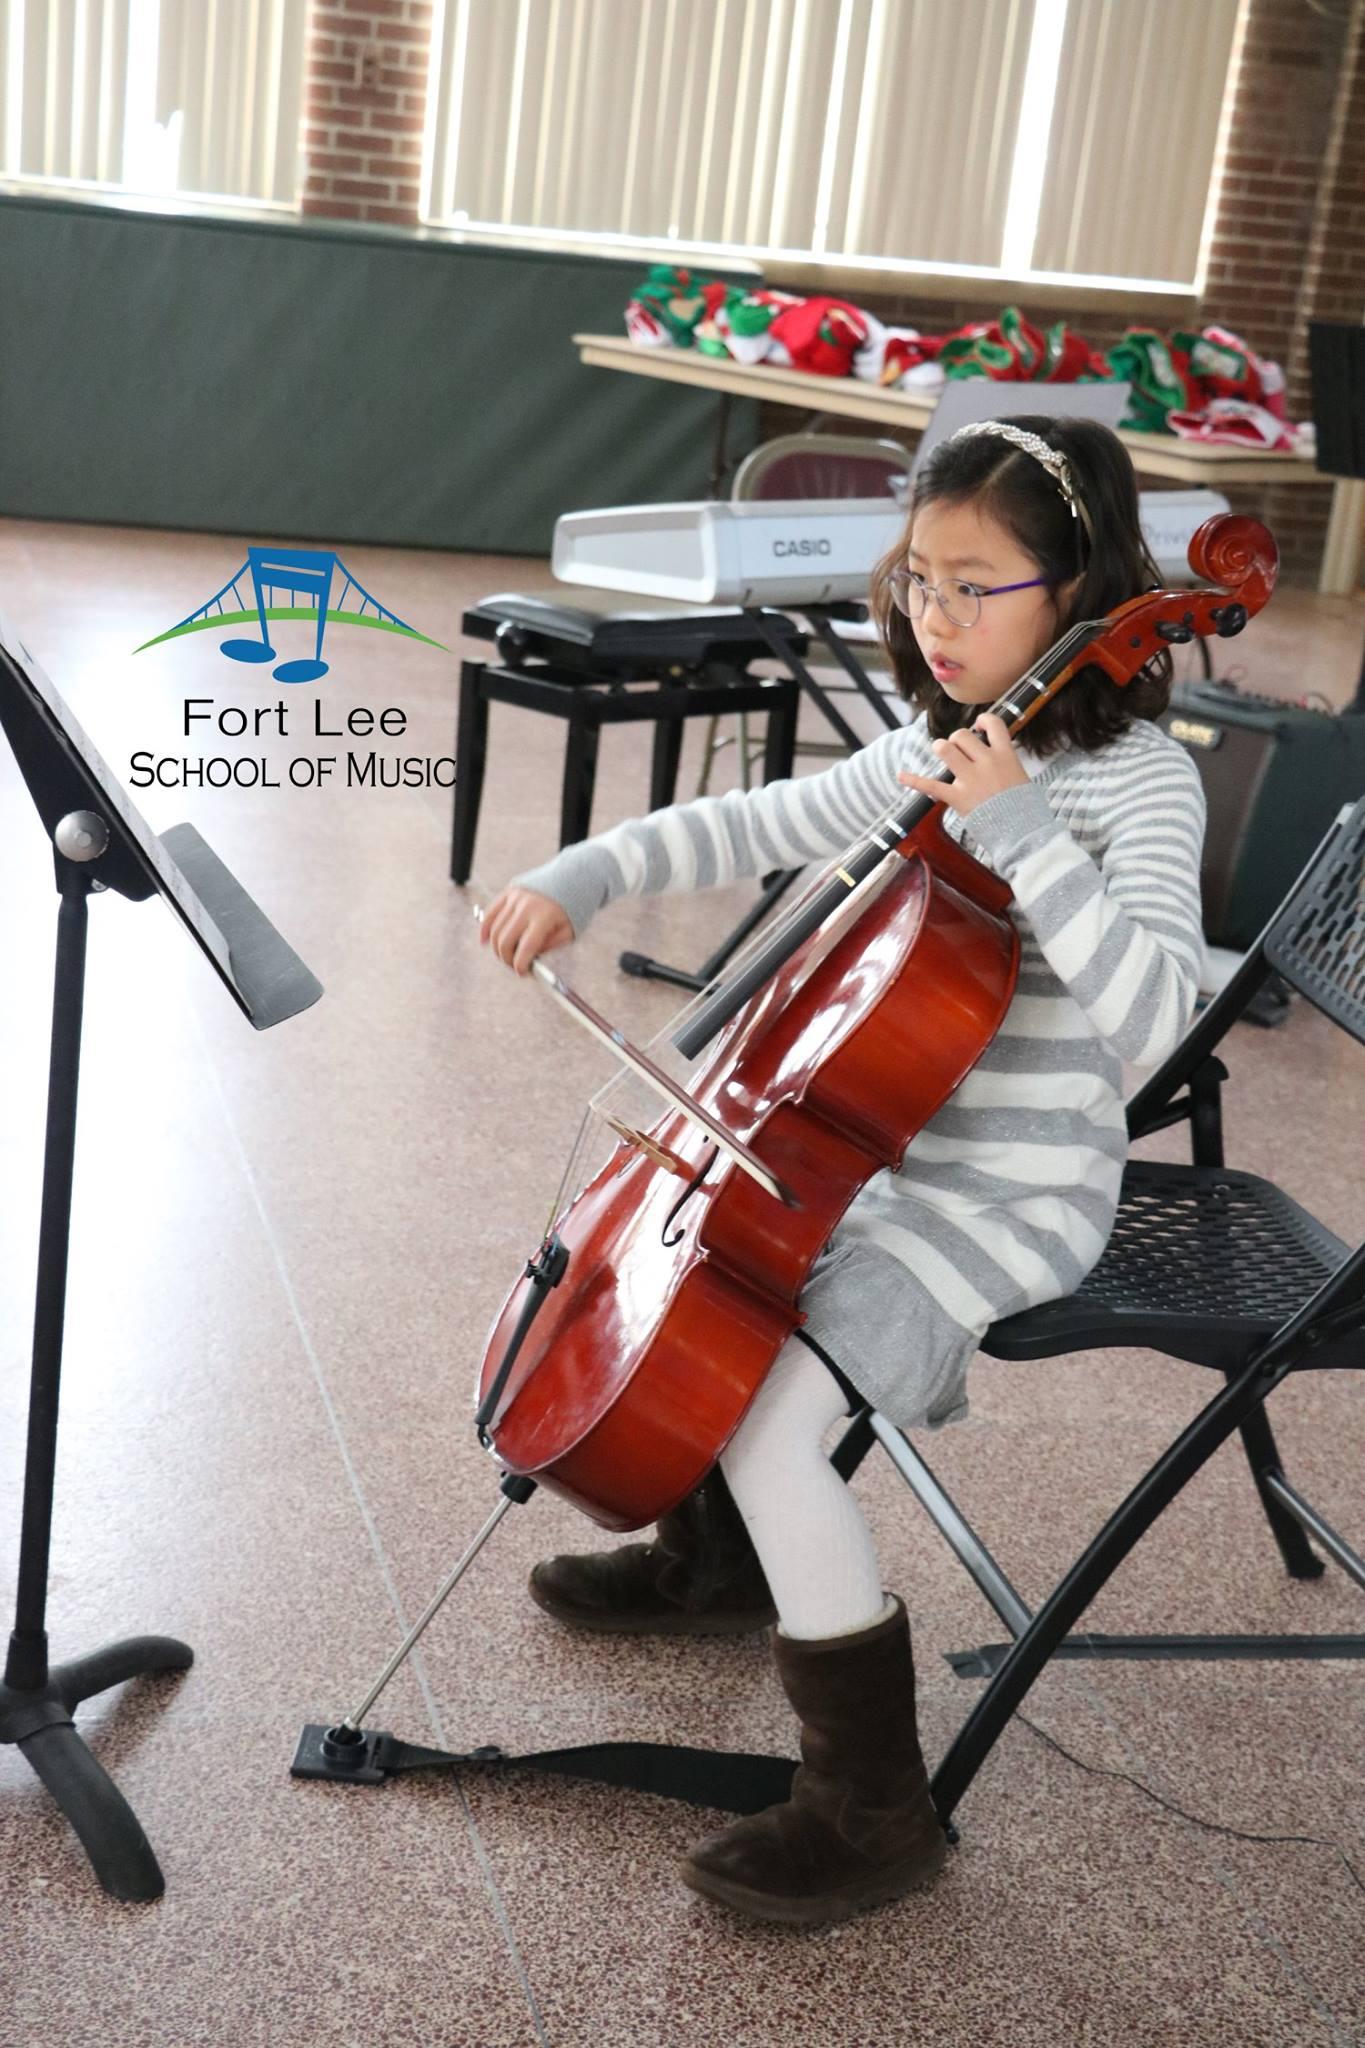 cello-for-kids-englewood-cliffs.jpg